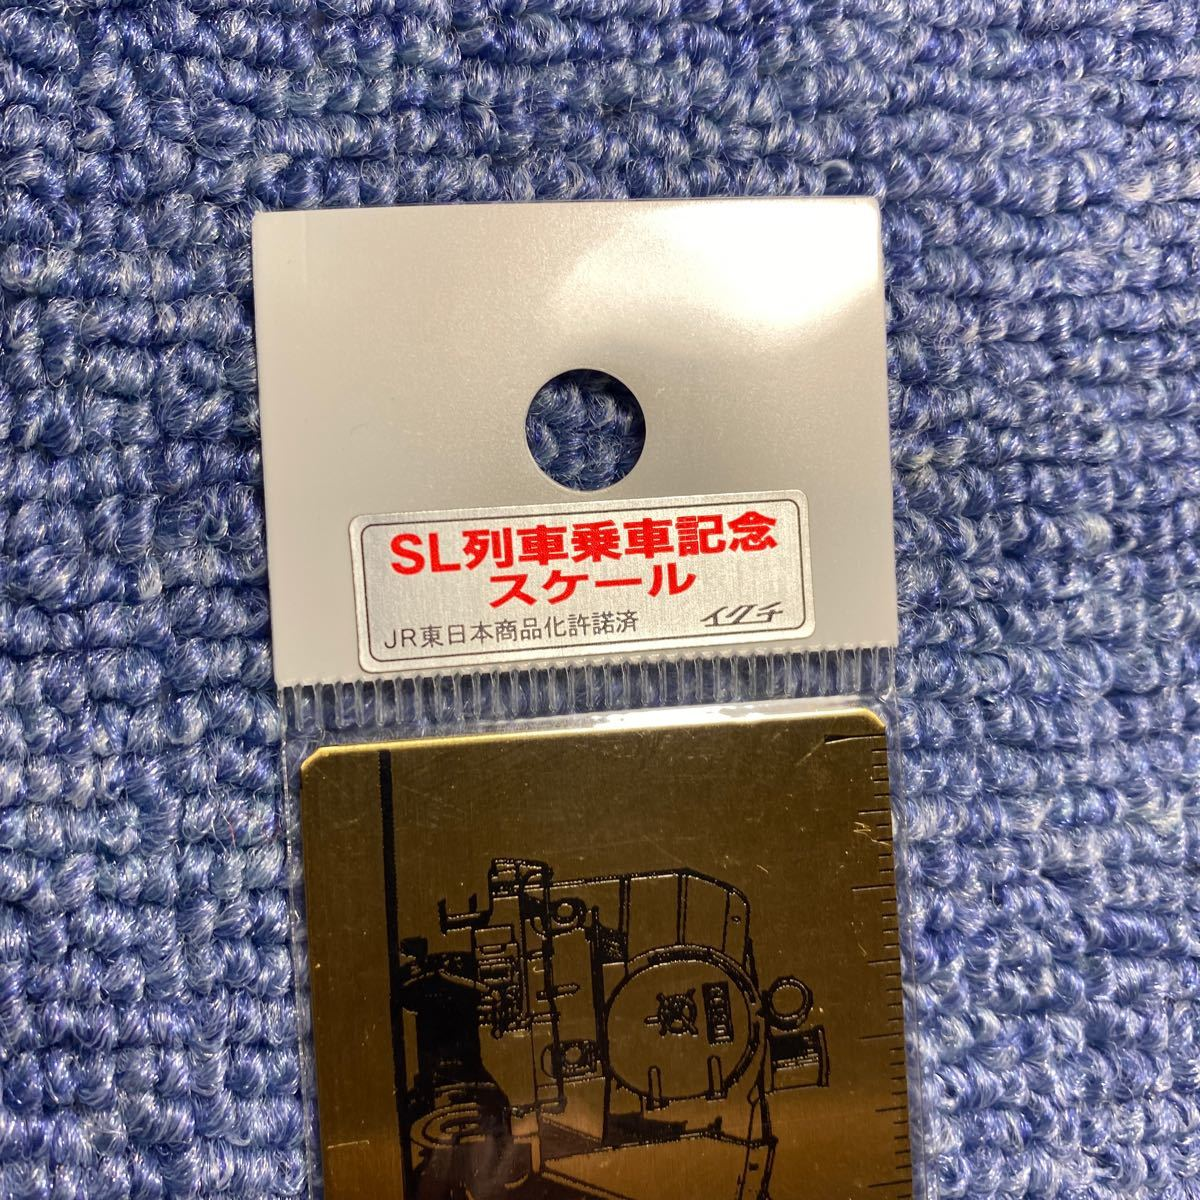 SL列車乗車記念 イクチ C6120 蒸気機関車 ゴールド 金属 定規 JR東日本承認 電車 鉄道グッズ コレクション レア 未使用_画像3